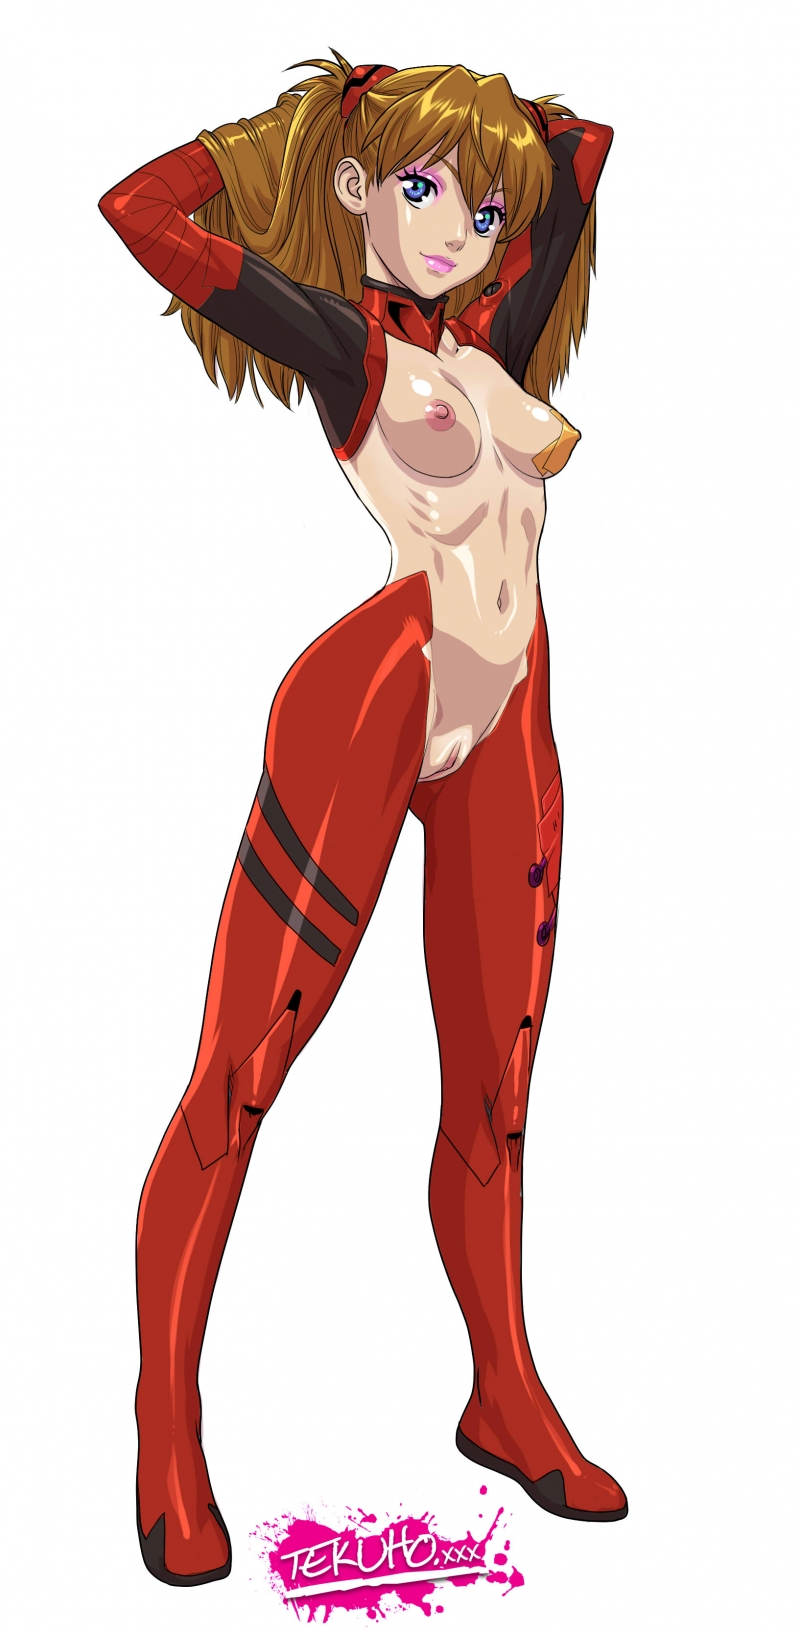 Asuka 1104455 - Asuka_Langley_Sohryu Neon_Genesis_Evangelion Rebuild_of_Evangelion tekuho.jpg